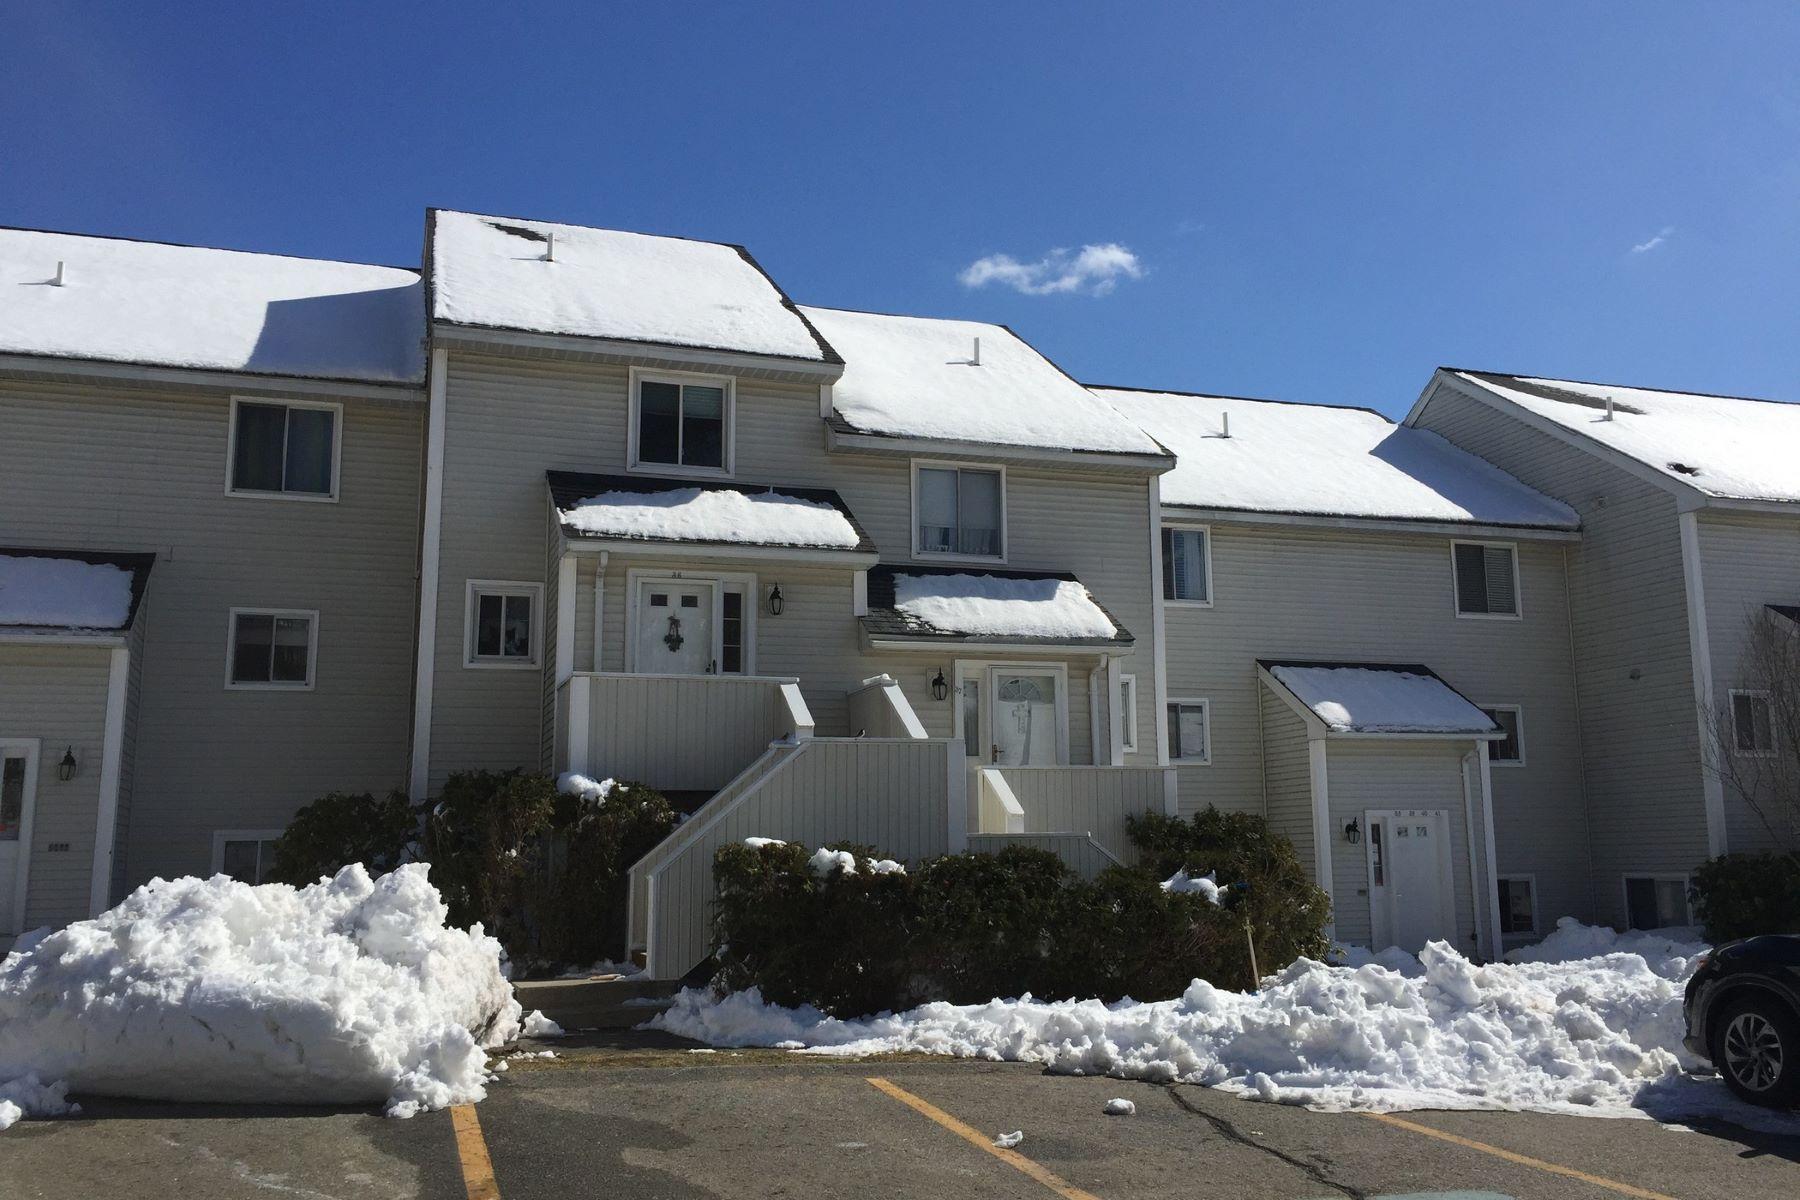 Condominio per Vendita alle ore Townhouse at The Cascades 100 Merrimack Ave - Unit 36 Dracut, Massachusetts, 01826 Stati Uniti